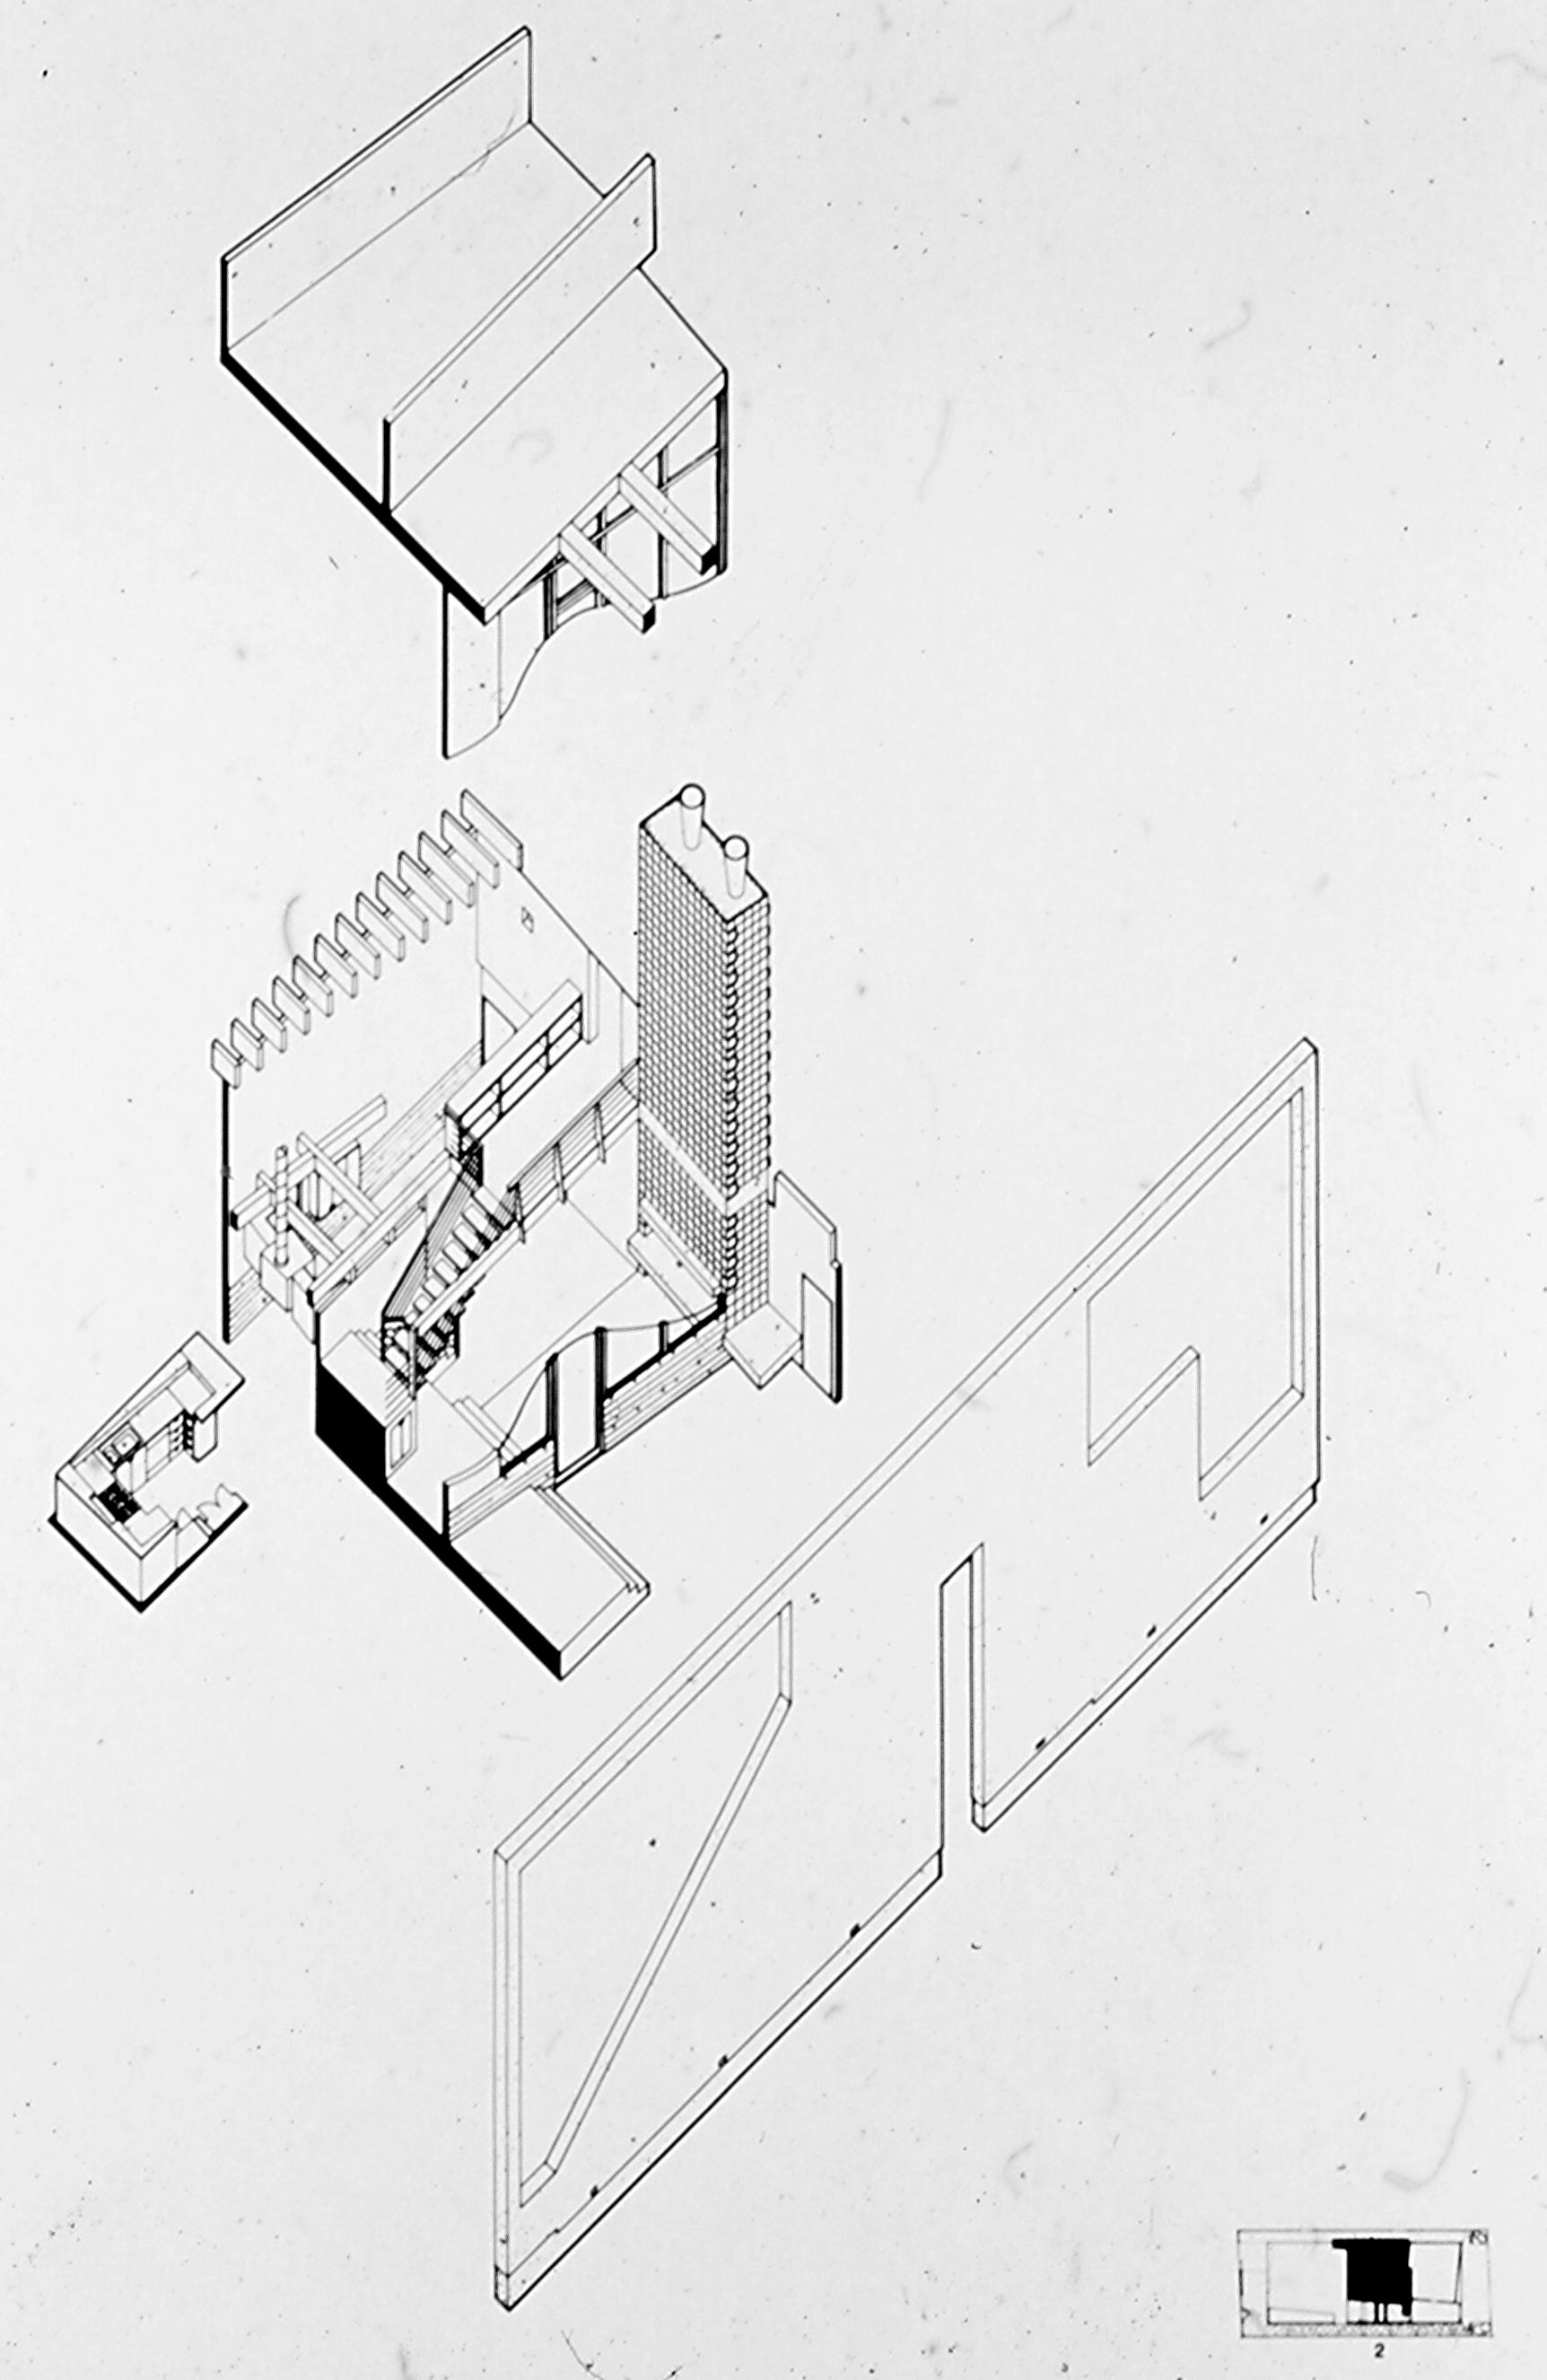 S.E.A.-Studio-Environmental-Architecture-David-Hertz-FAIA-Venable-House-Venice-Beach-sustainable-regenerative-restorative-design-residential-contemporary-modern-passive-systems-recycled-wood-concrete-green-building-canal-beachhouse-studioea-axon-2.jpg